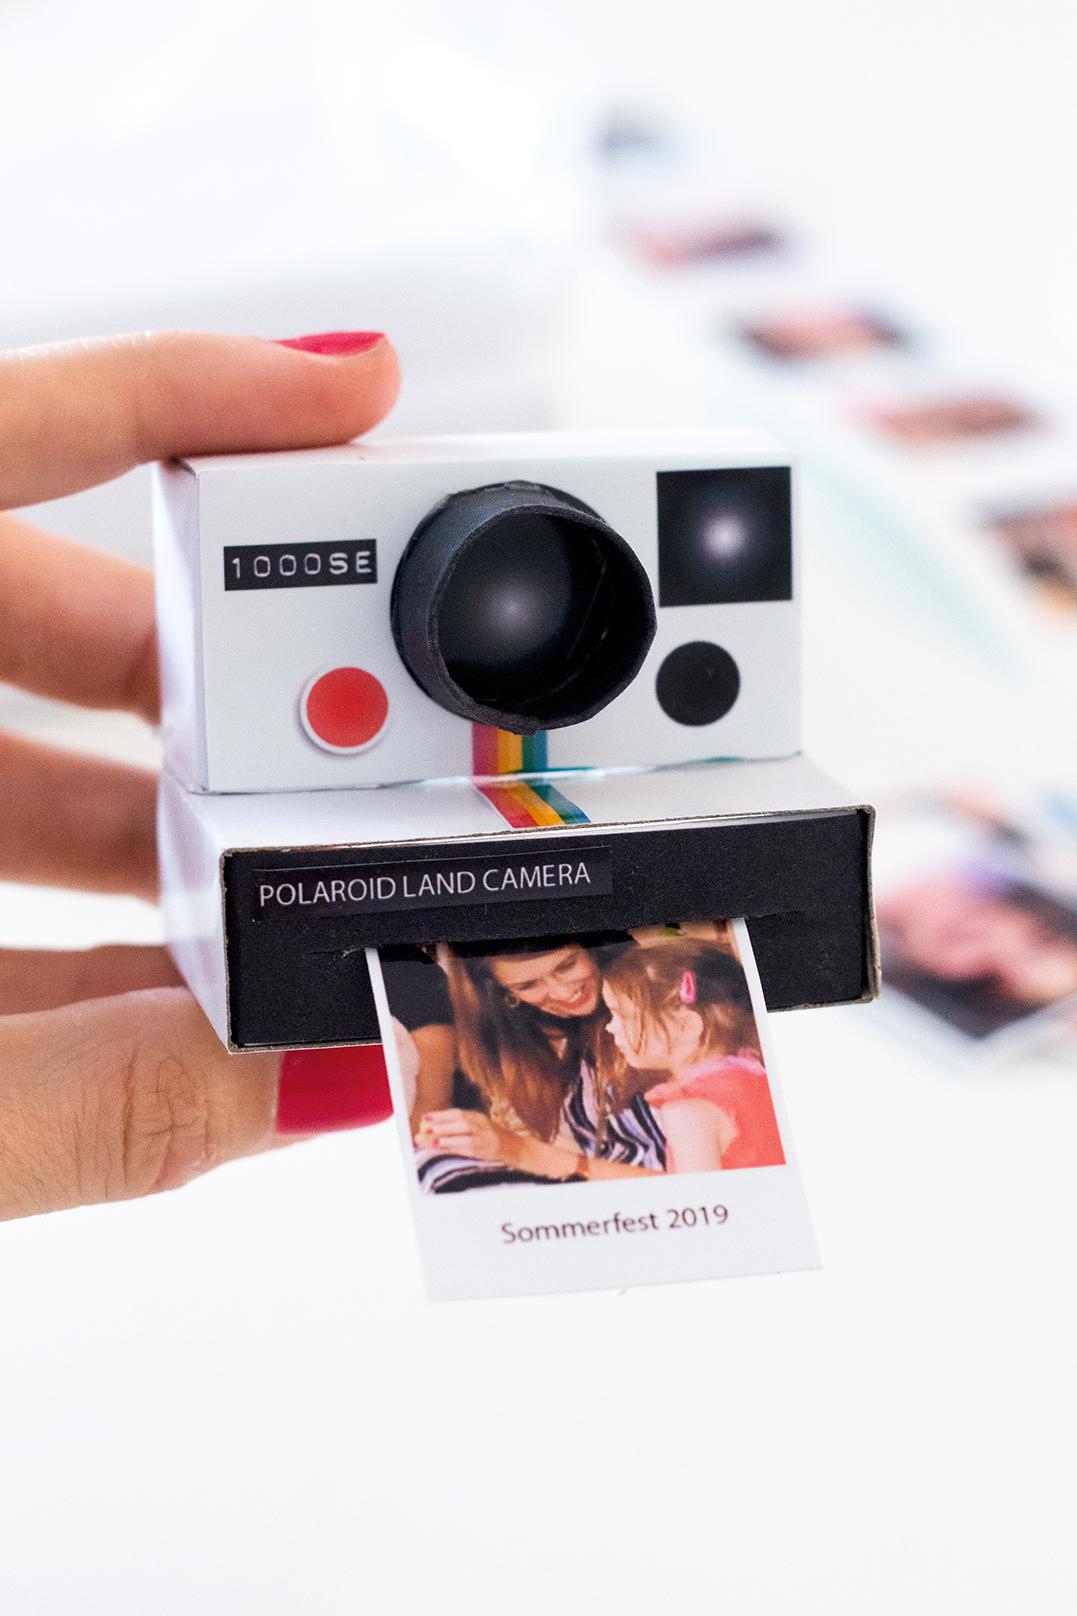 Polaroid basteln Fotogeschenk